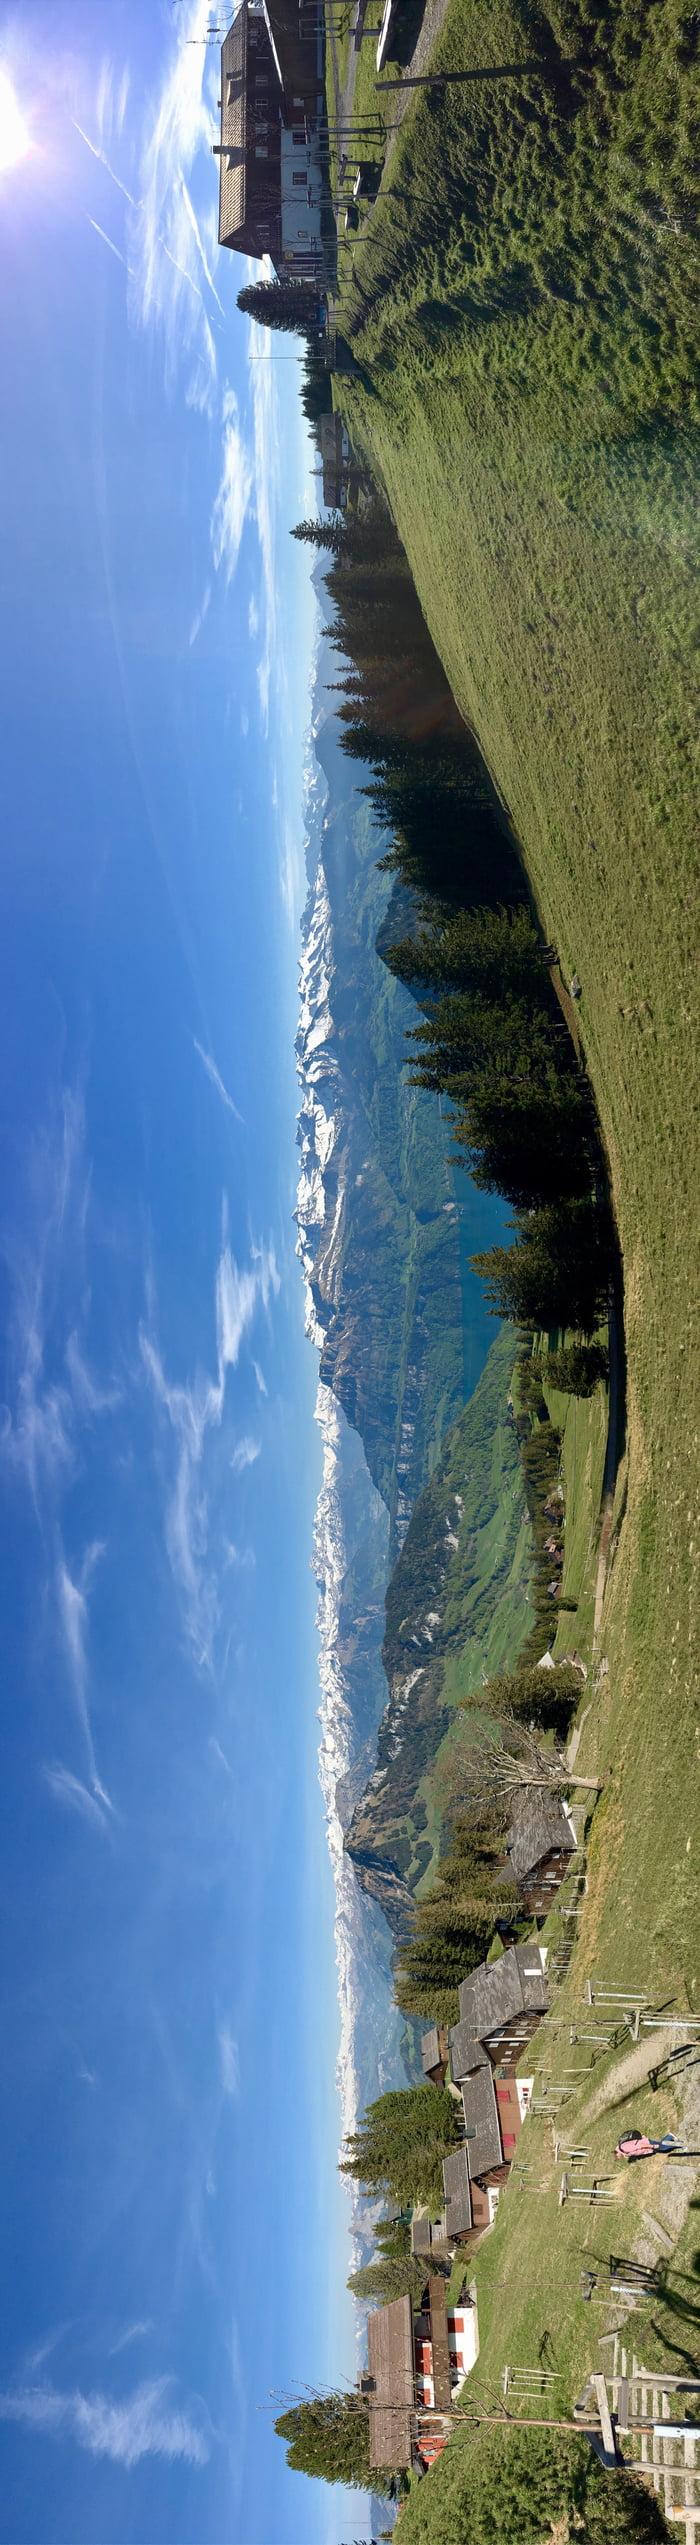 Panorama @ 1670m - Scheidegg, Switzerland [from an interesting perspective]